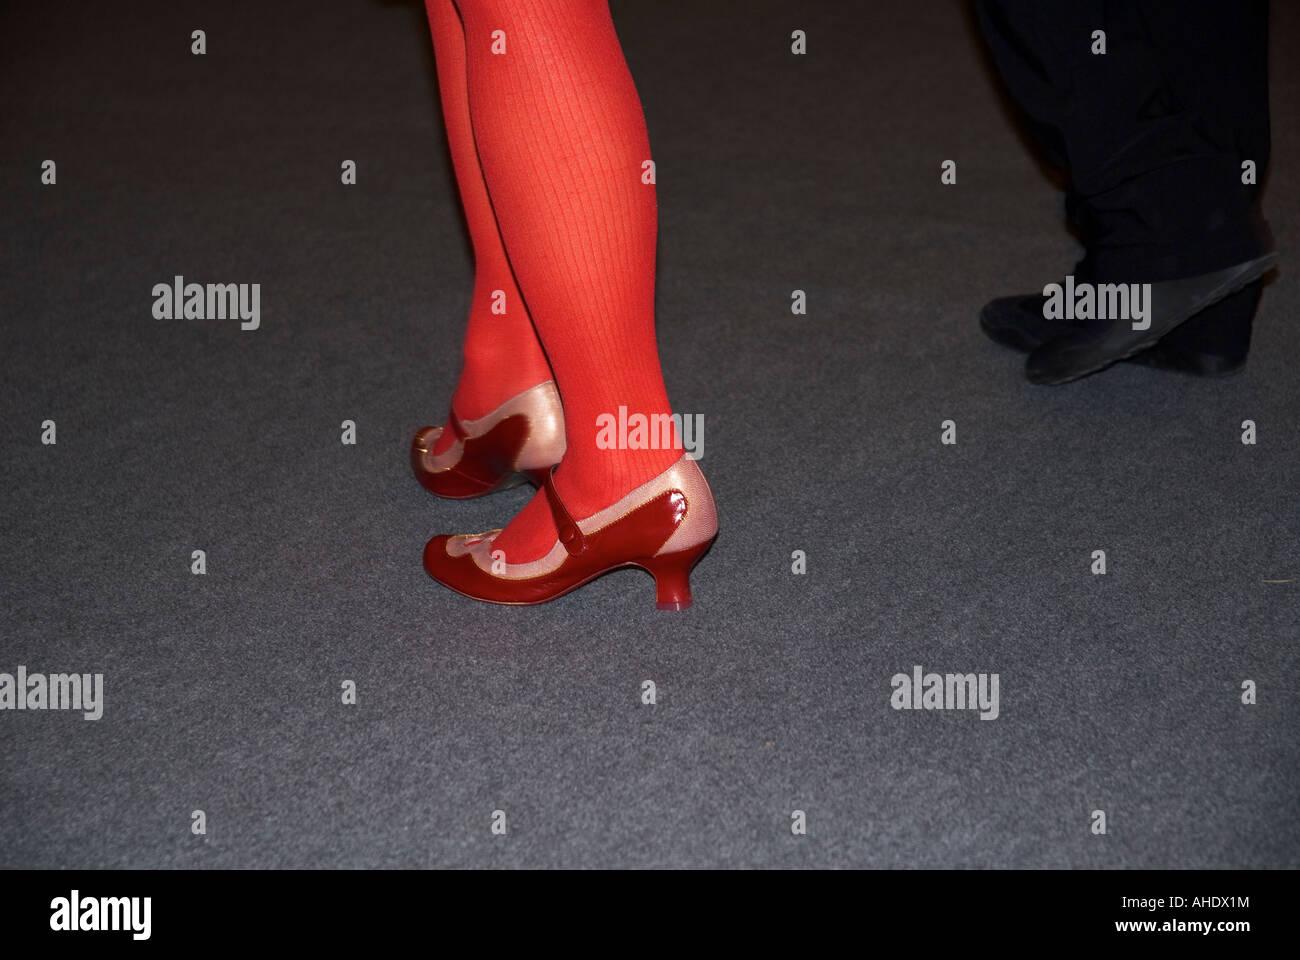 Feet - Stock Image